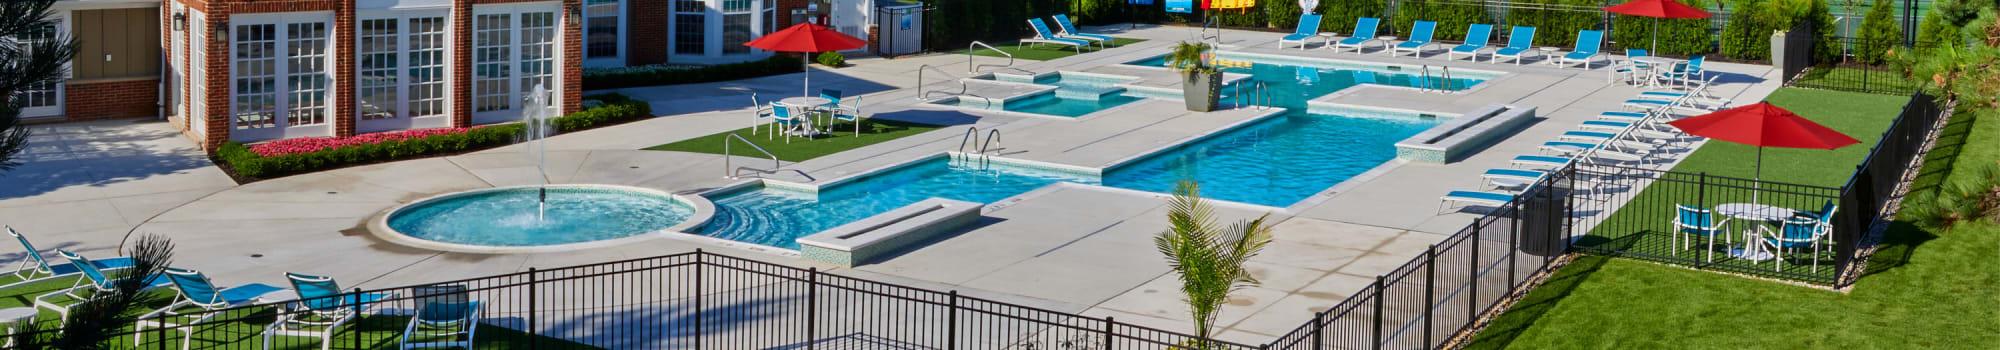 Suite stays at Citation Club in Farmington Hills, Michigan